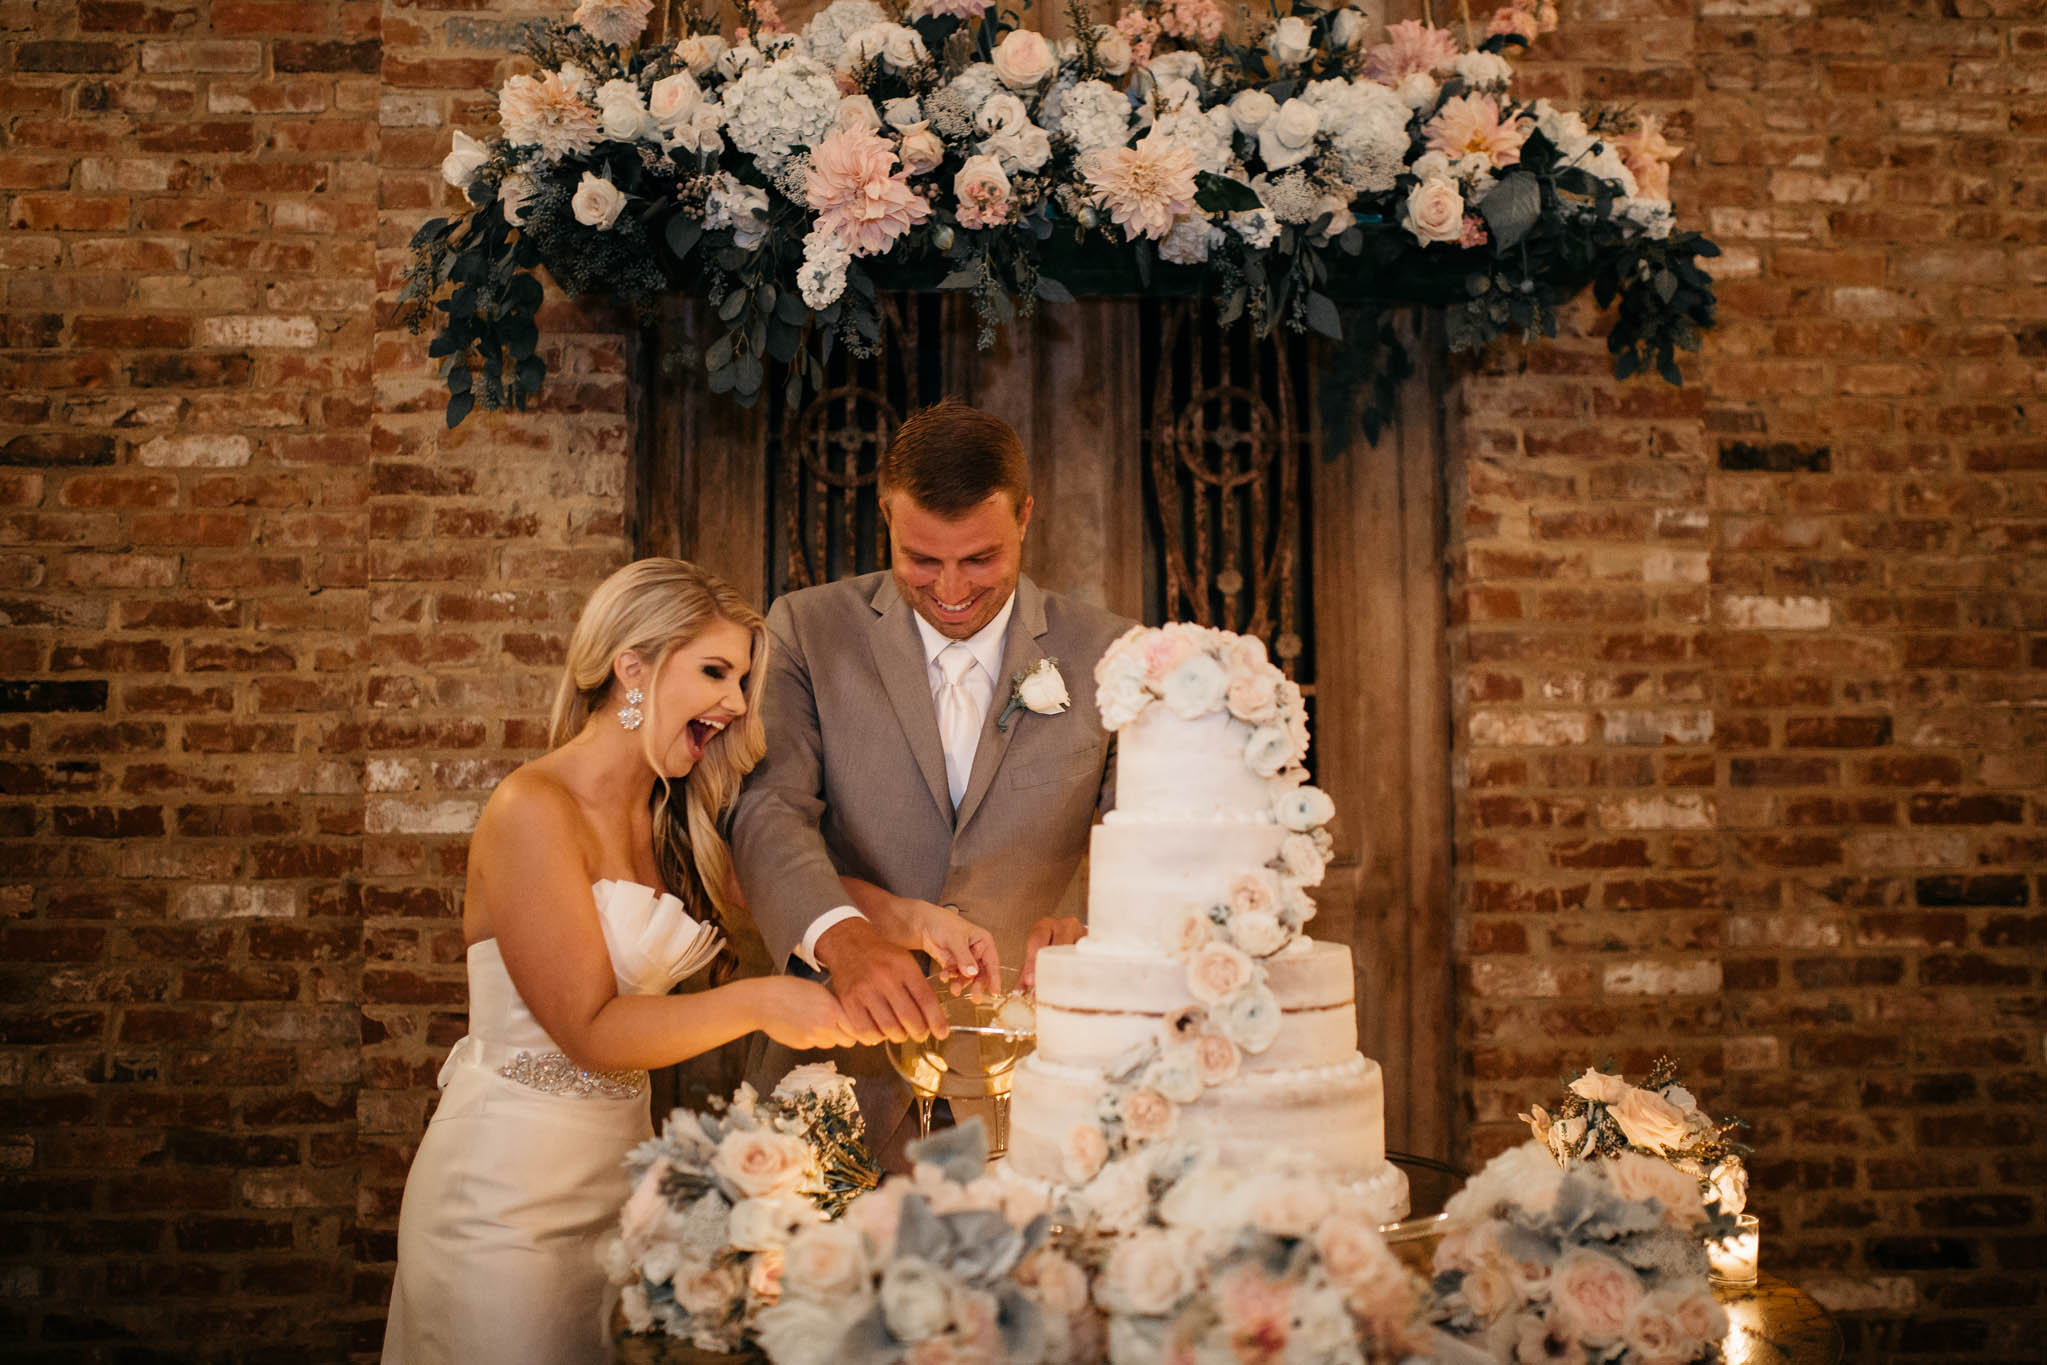 The Hatches   An Elegant Garden Wedding   Cedar Hall   Memphis Tennessee Wedding and Elopement Photographers   memphis-tennessee-utah-colorado-arizona-washington-wedding-elopement-photographer-garden-elegant-warm-summer-classic-romantic-floral-vintage-cake-table